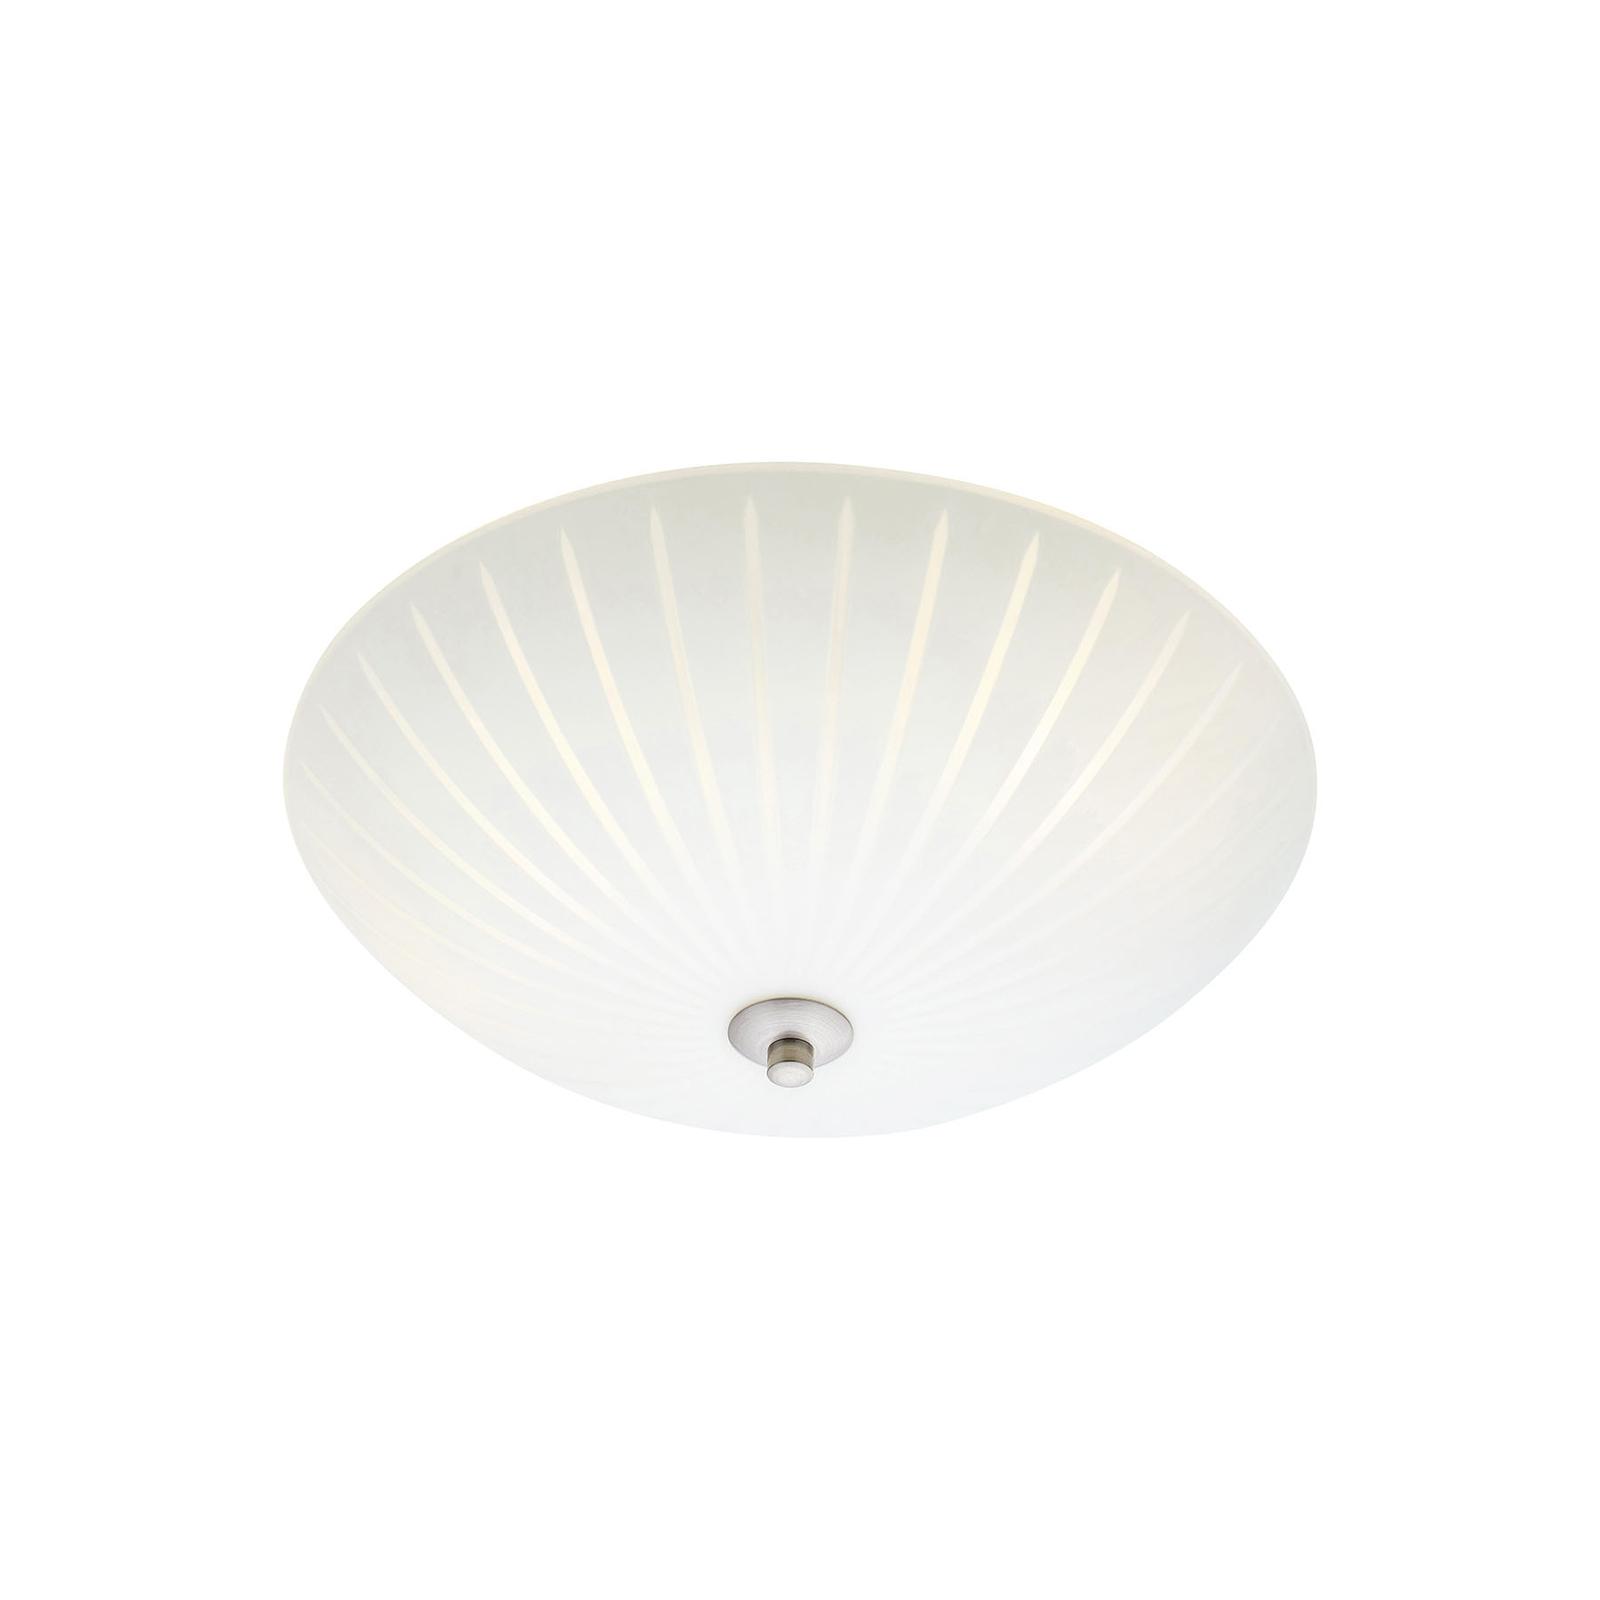 Glass-taklampe Cut, Ø 35 cm